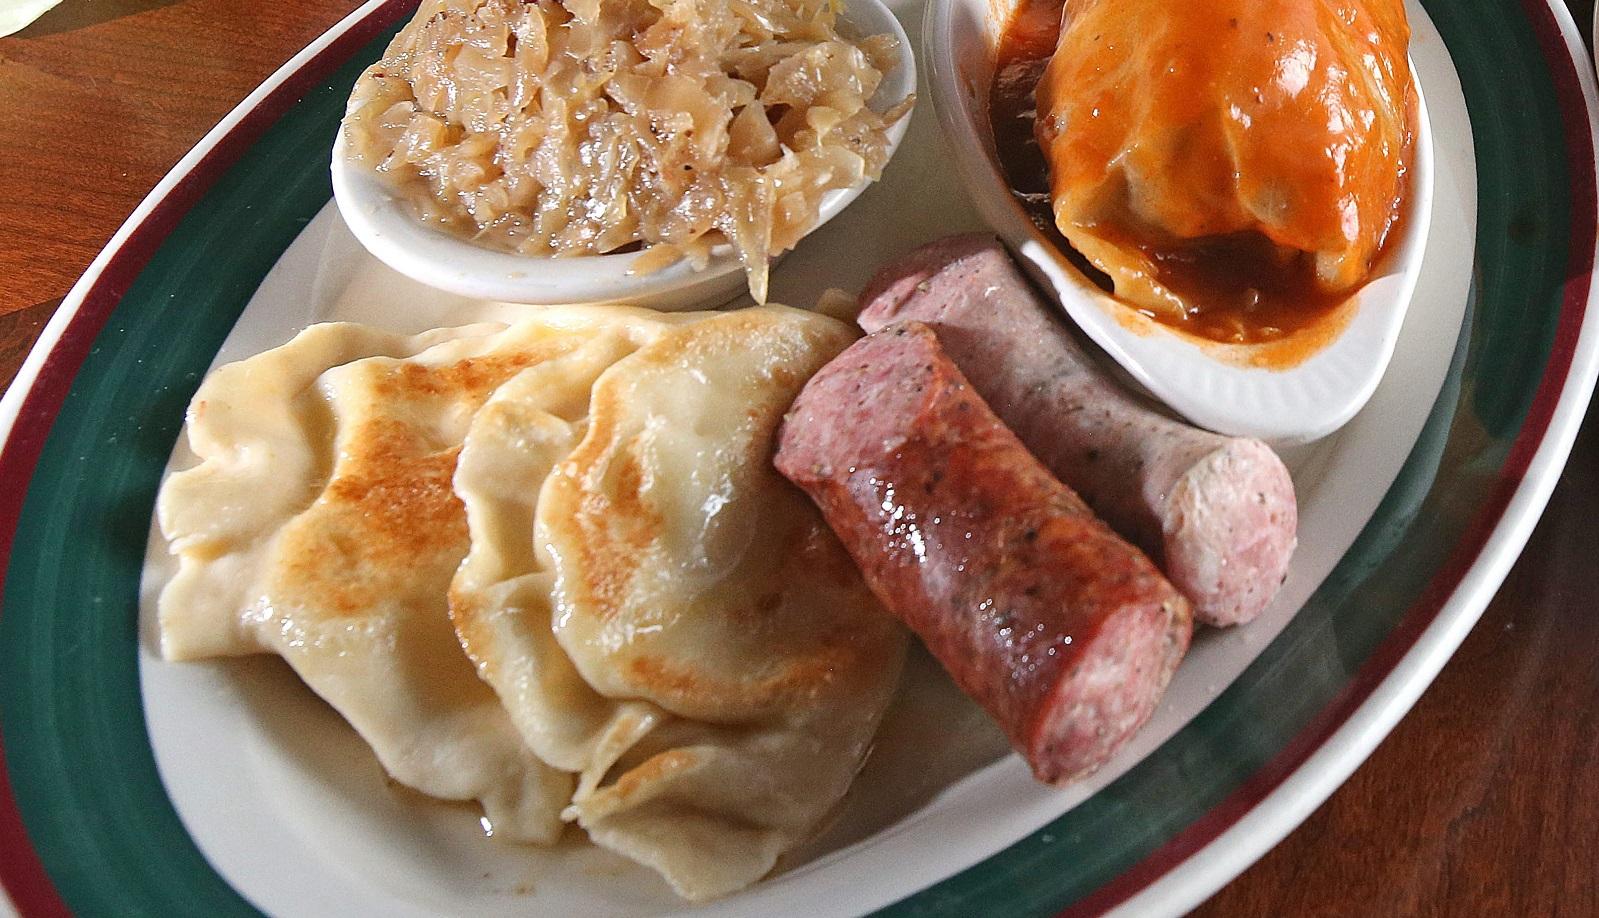 049 Anntonette Alberti, Jim Kelly and Barbara Chepaitis  | Polish Food